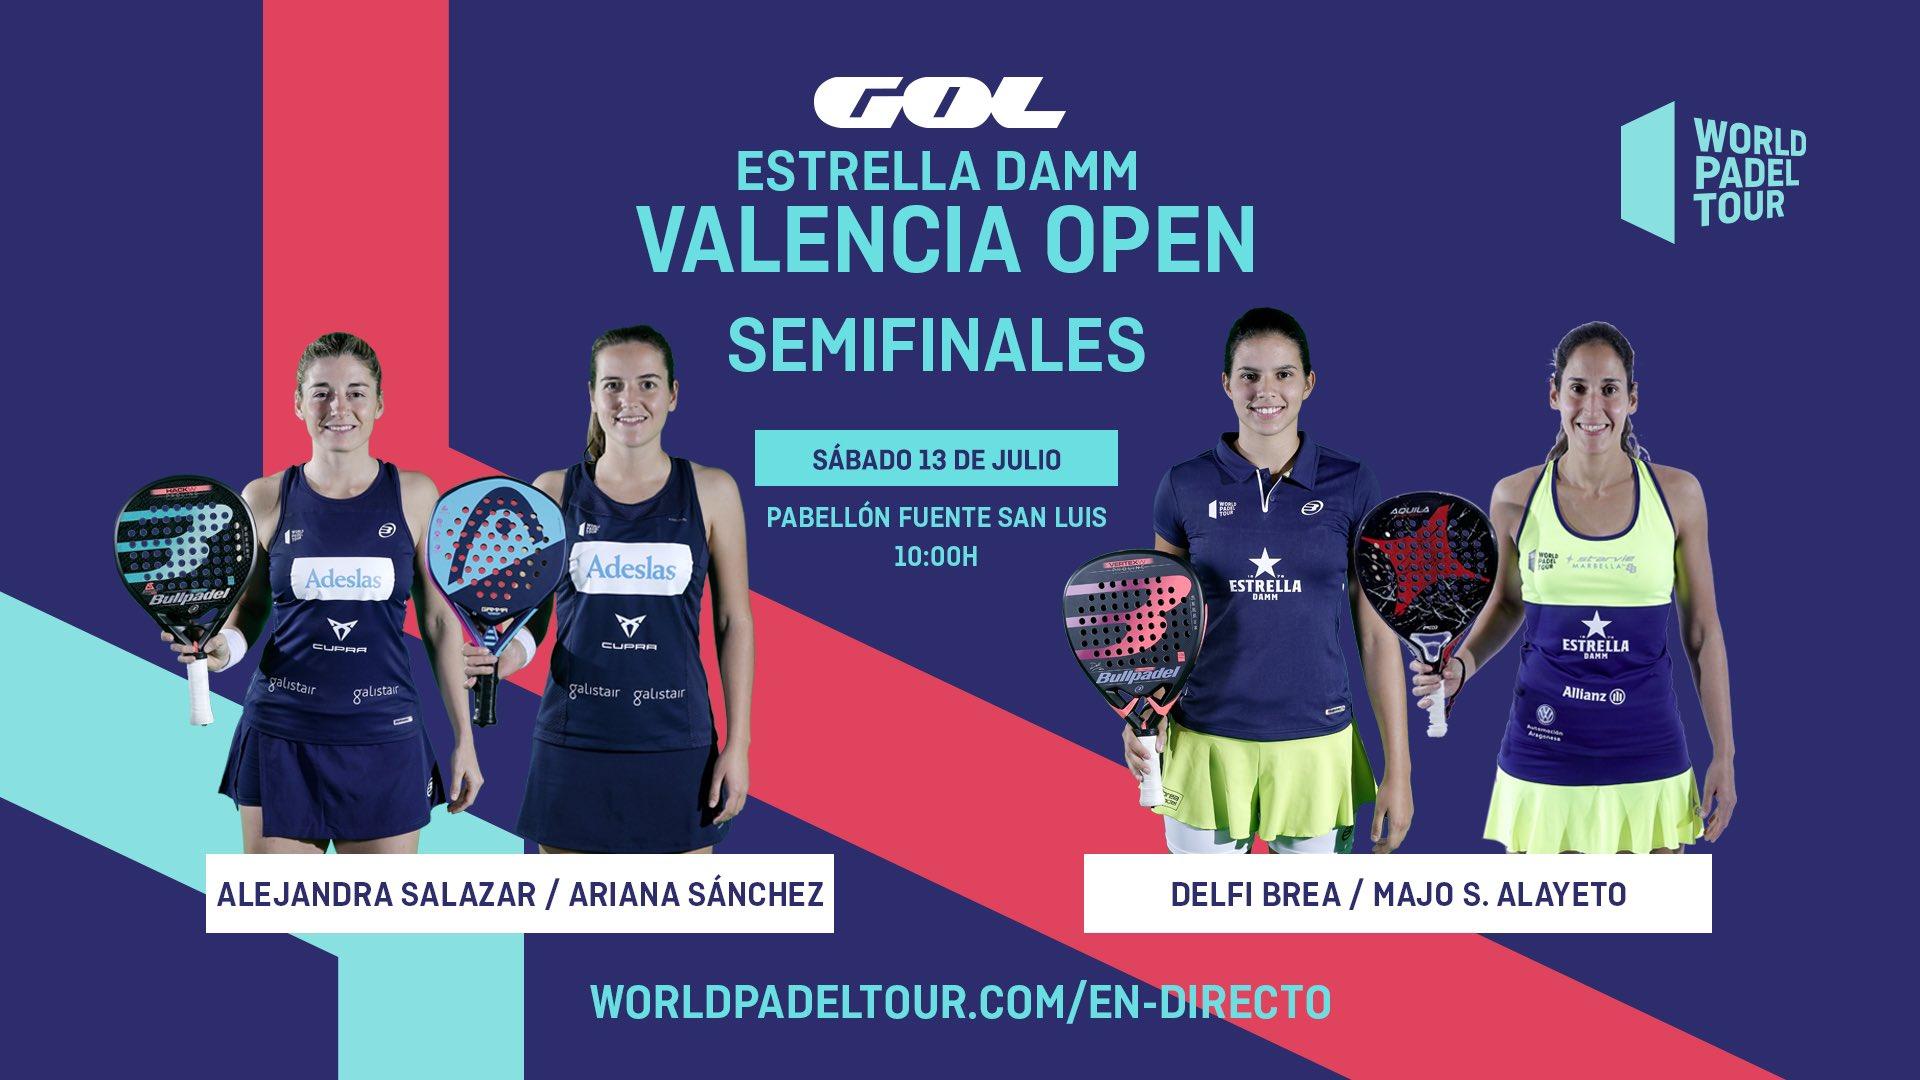 Ale Salazar/Ari Sánchez vs Majo S.Alayeto/Delfi Brea